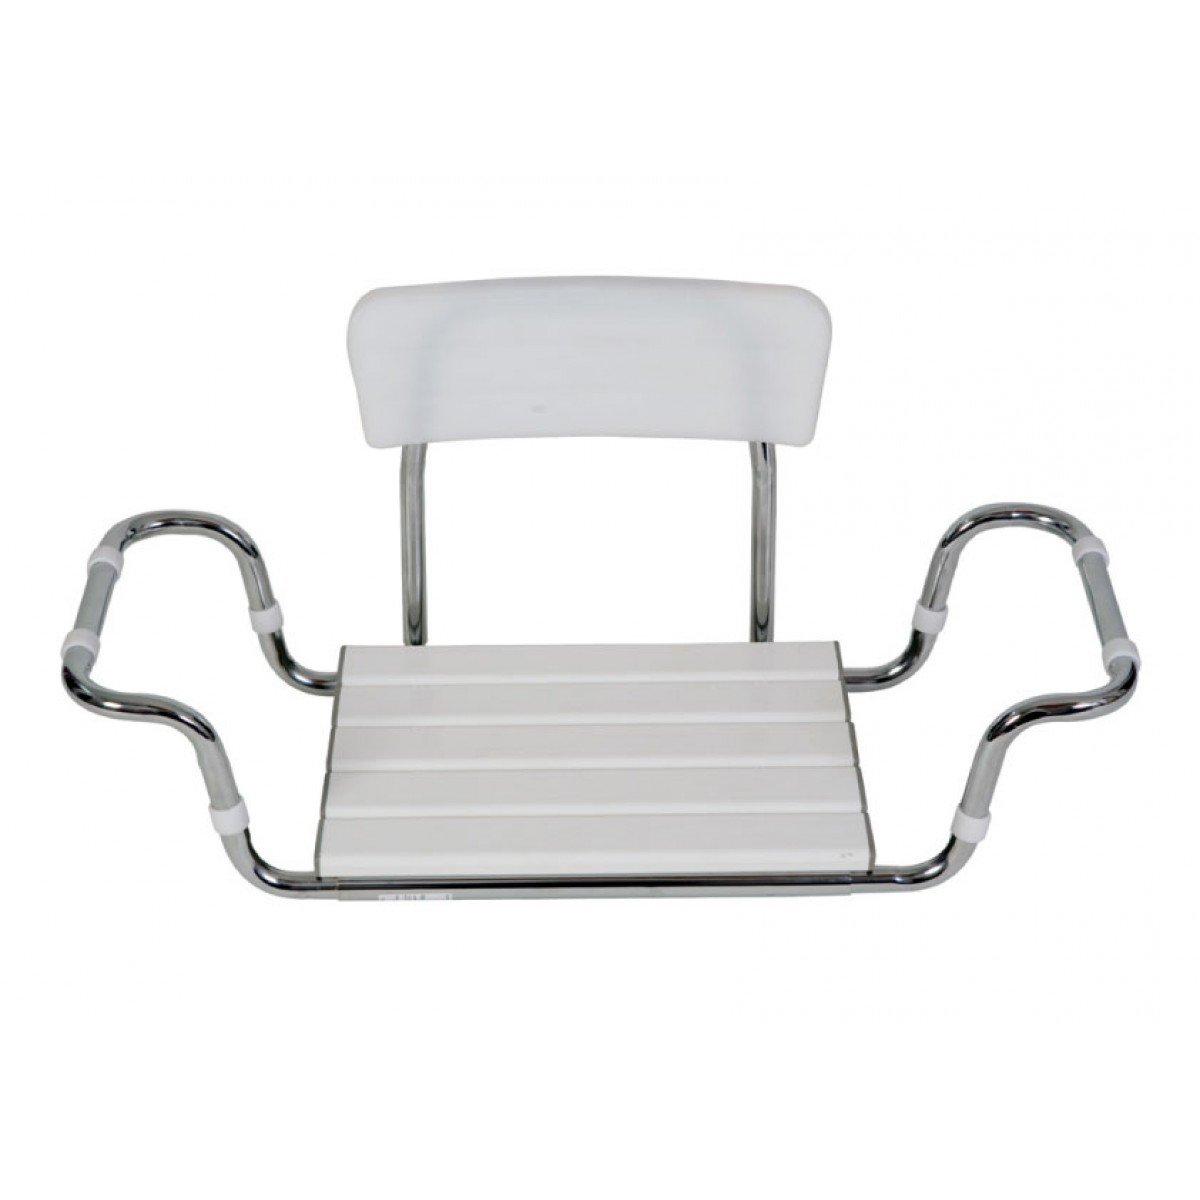 Sedile Per Vasca Da Bagno Con Schienale Termigea Ba20 Medinolrent